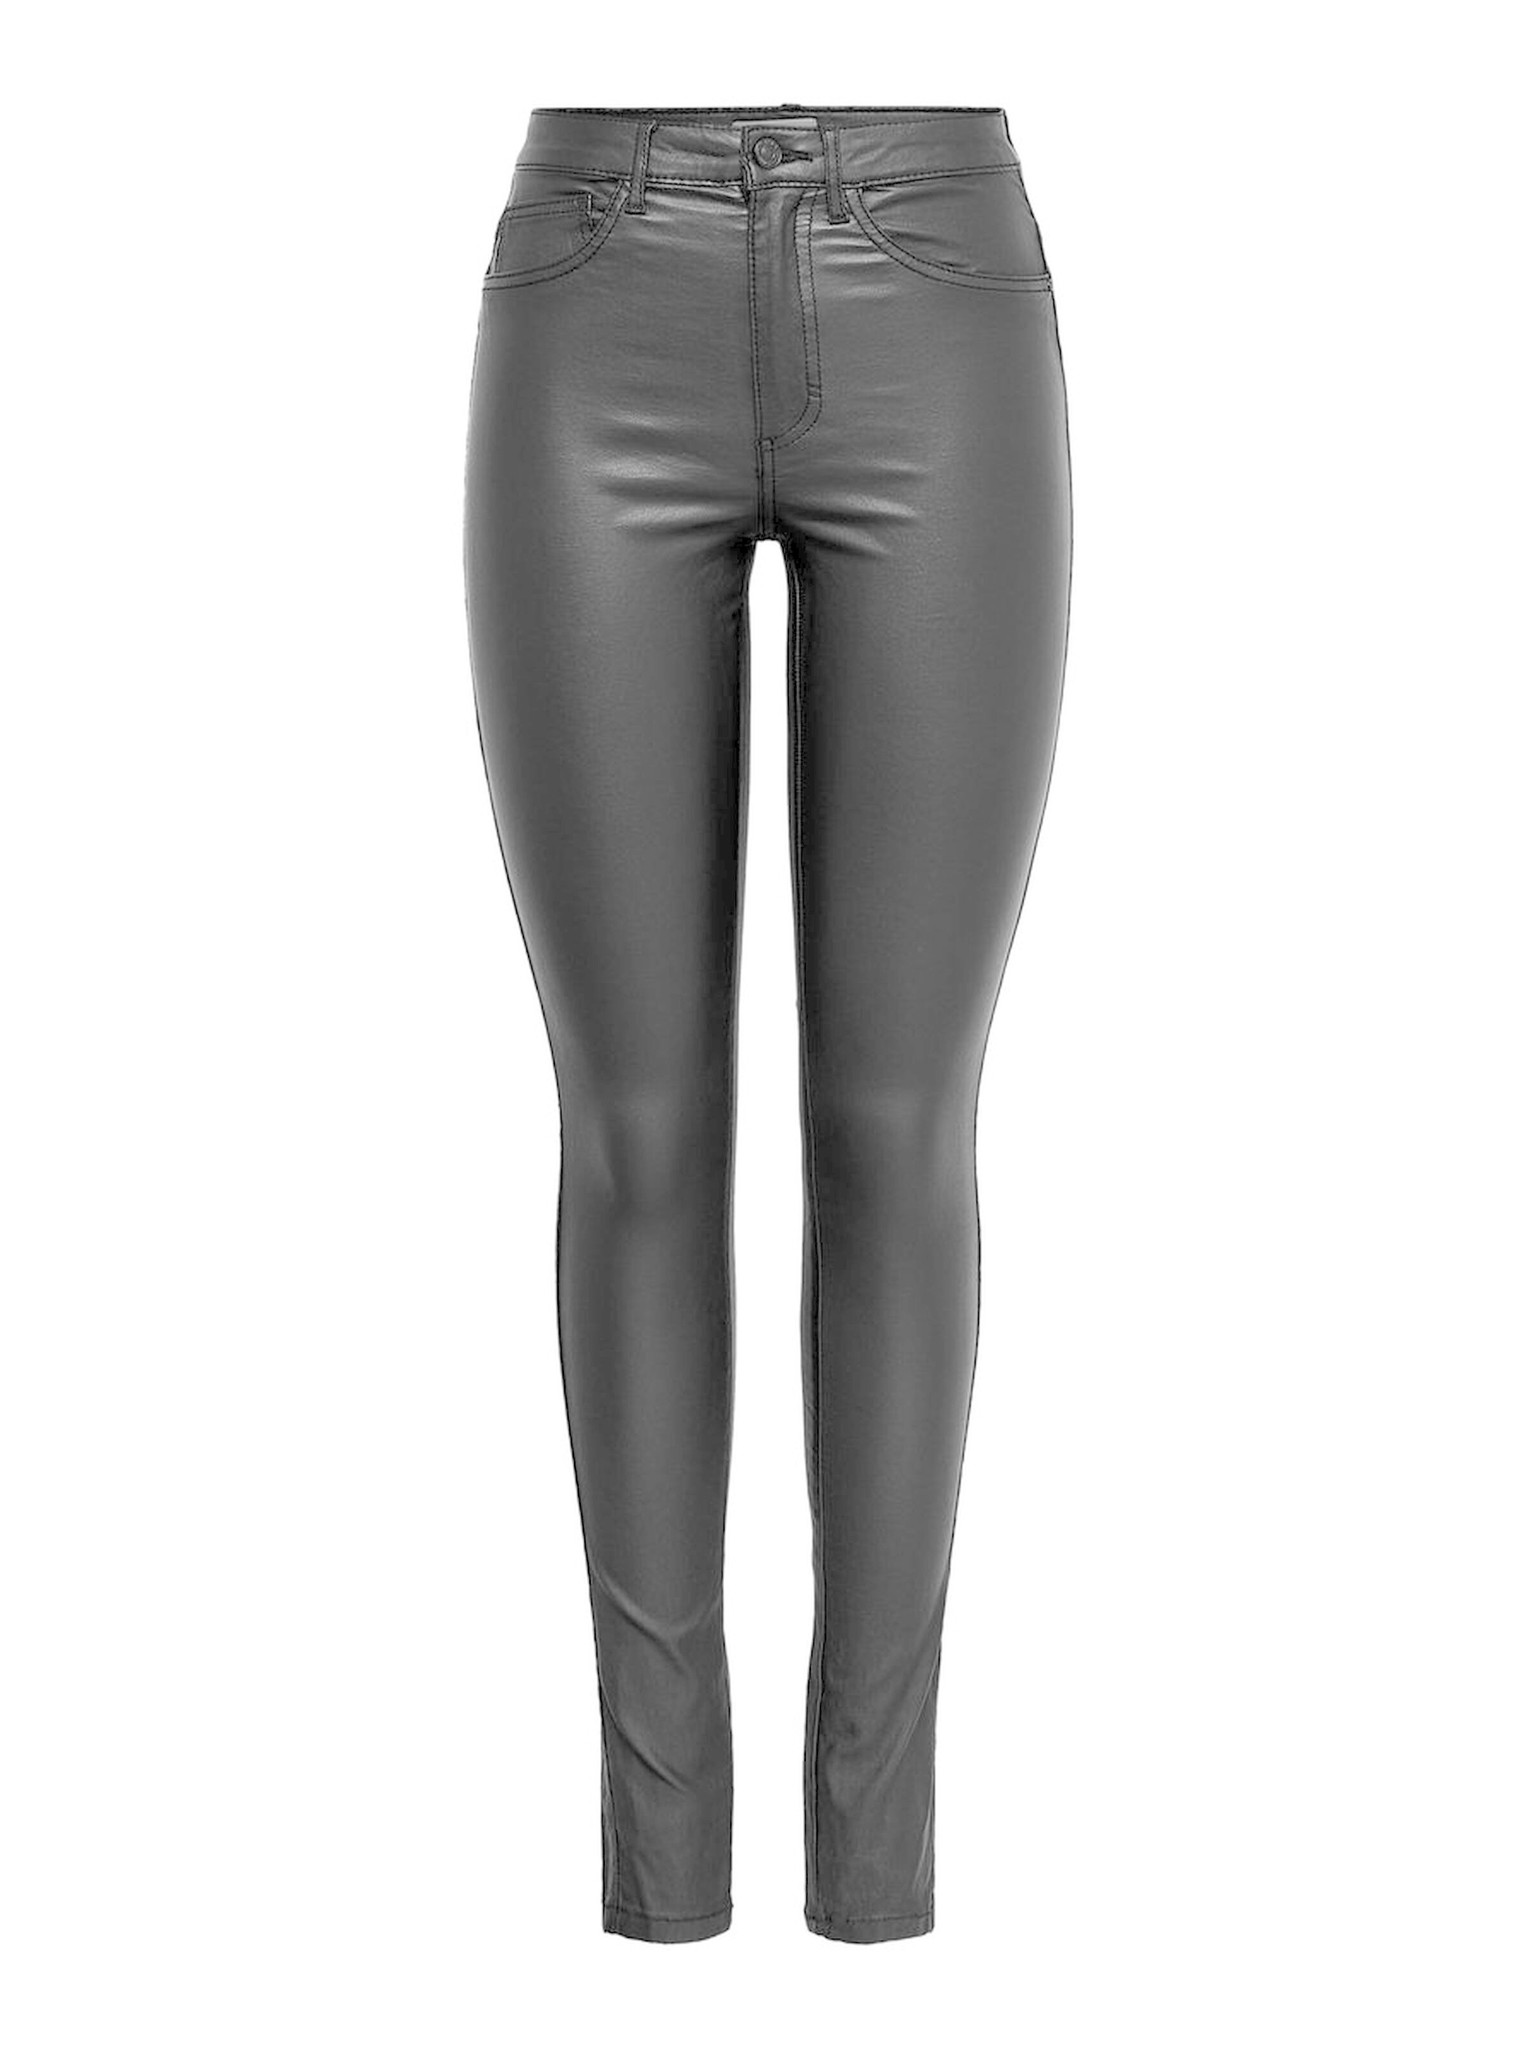 PEPITES pantalon royal noos-1